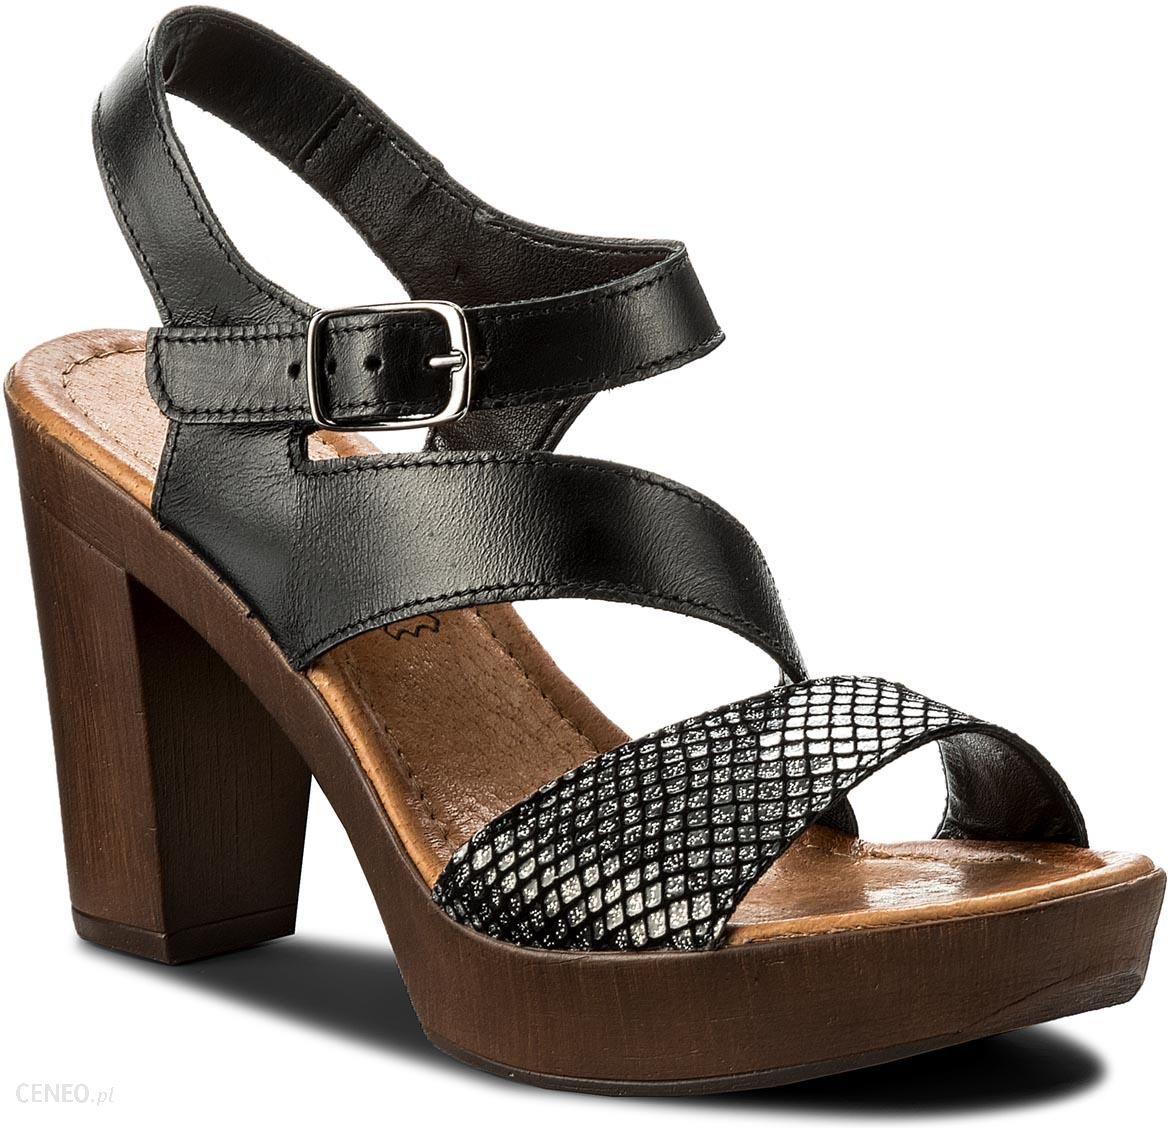 Sandały LASOCKI 2148 04 Black